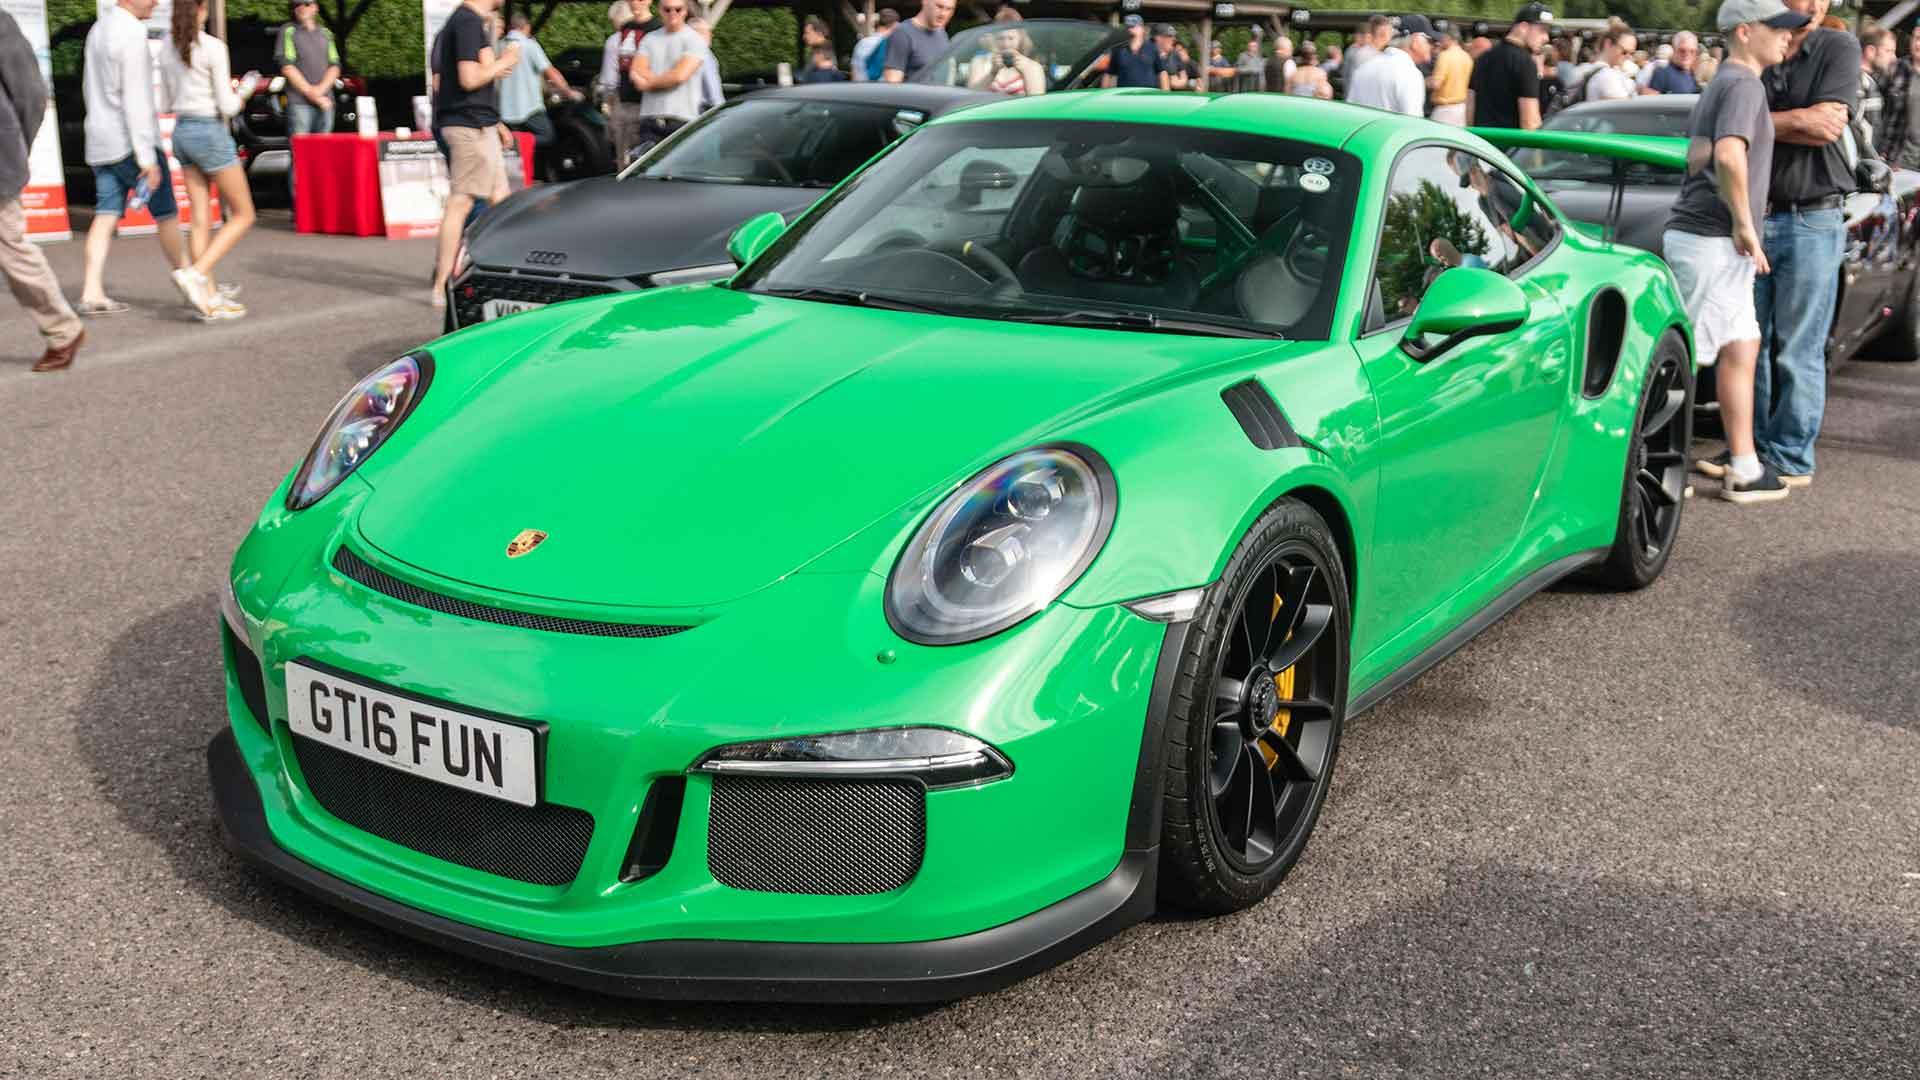 Porsche 911 GT3 RS at Goodwood Supercar Sunday